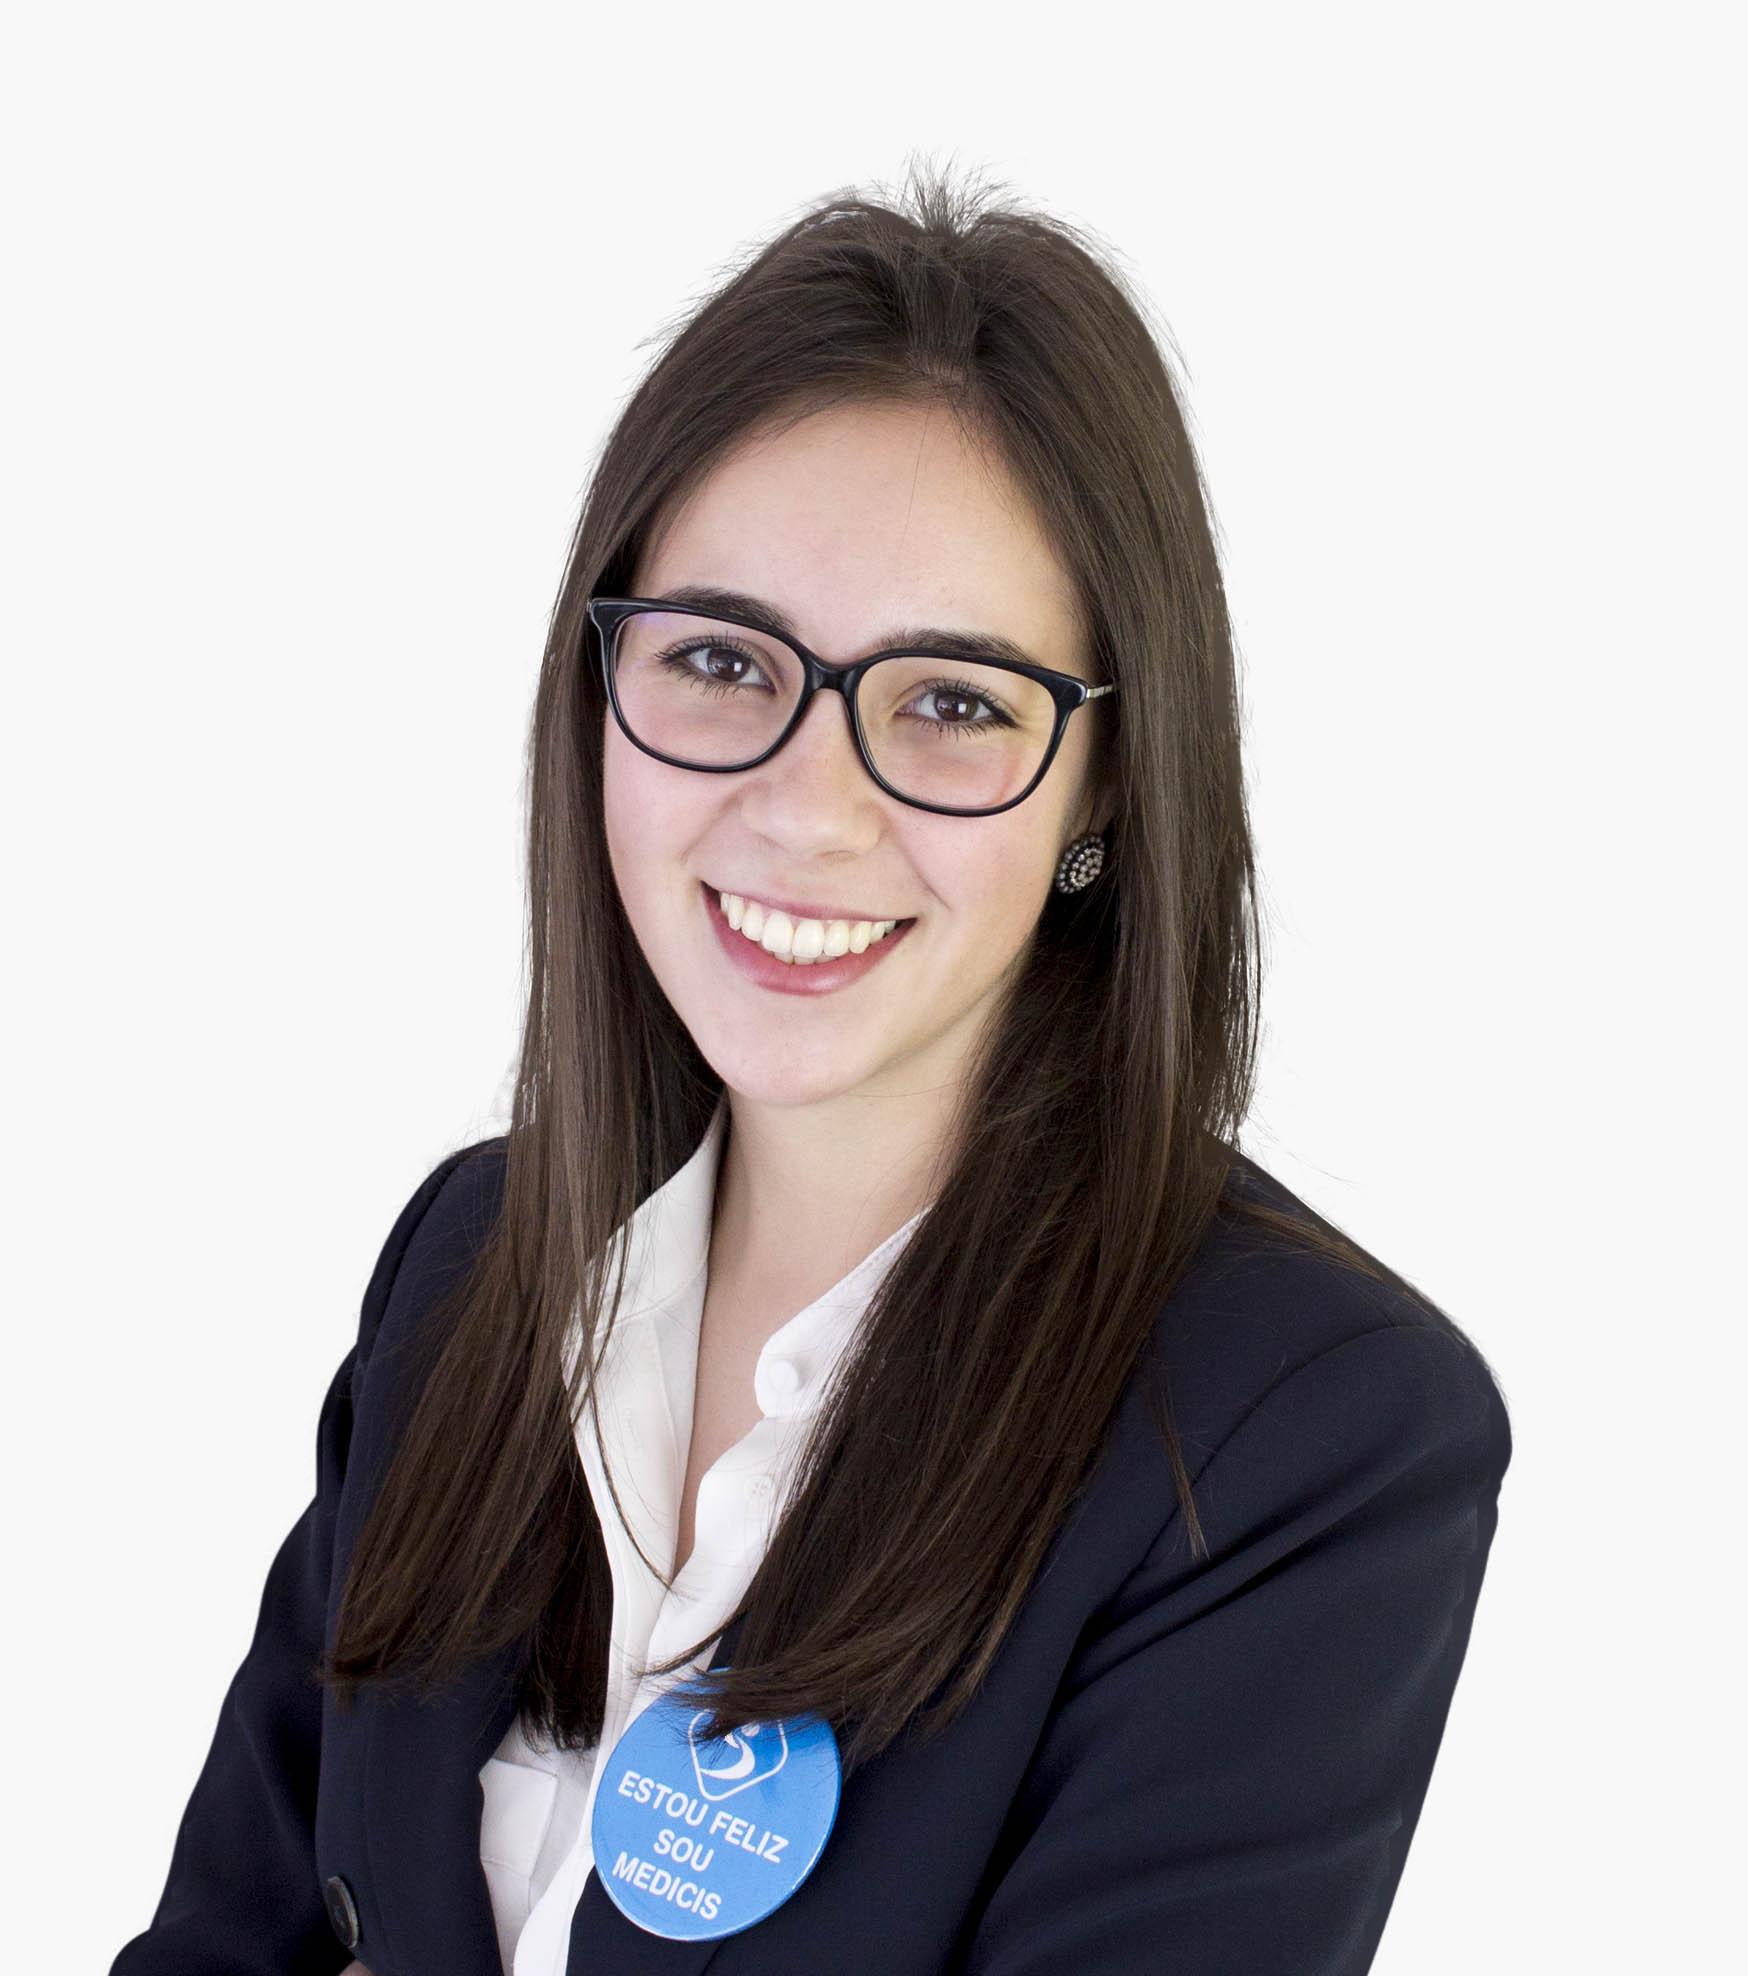 Filipa Pedrosa